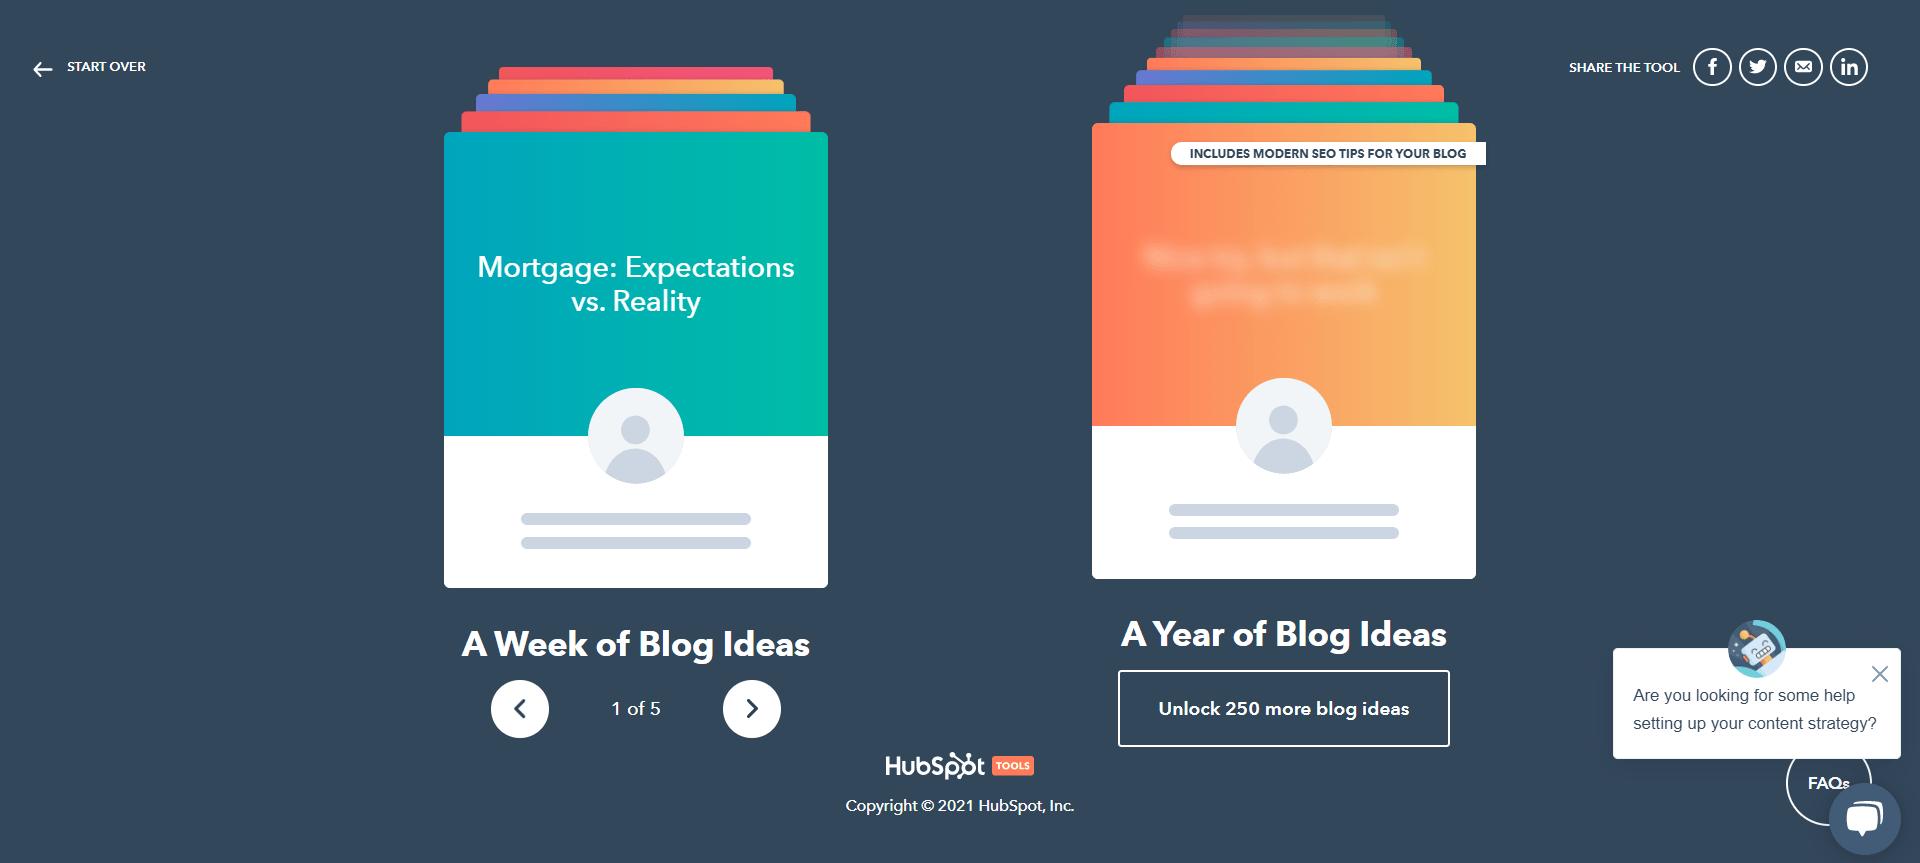 HubSpot content generator results